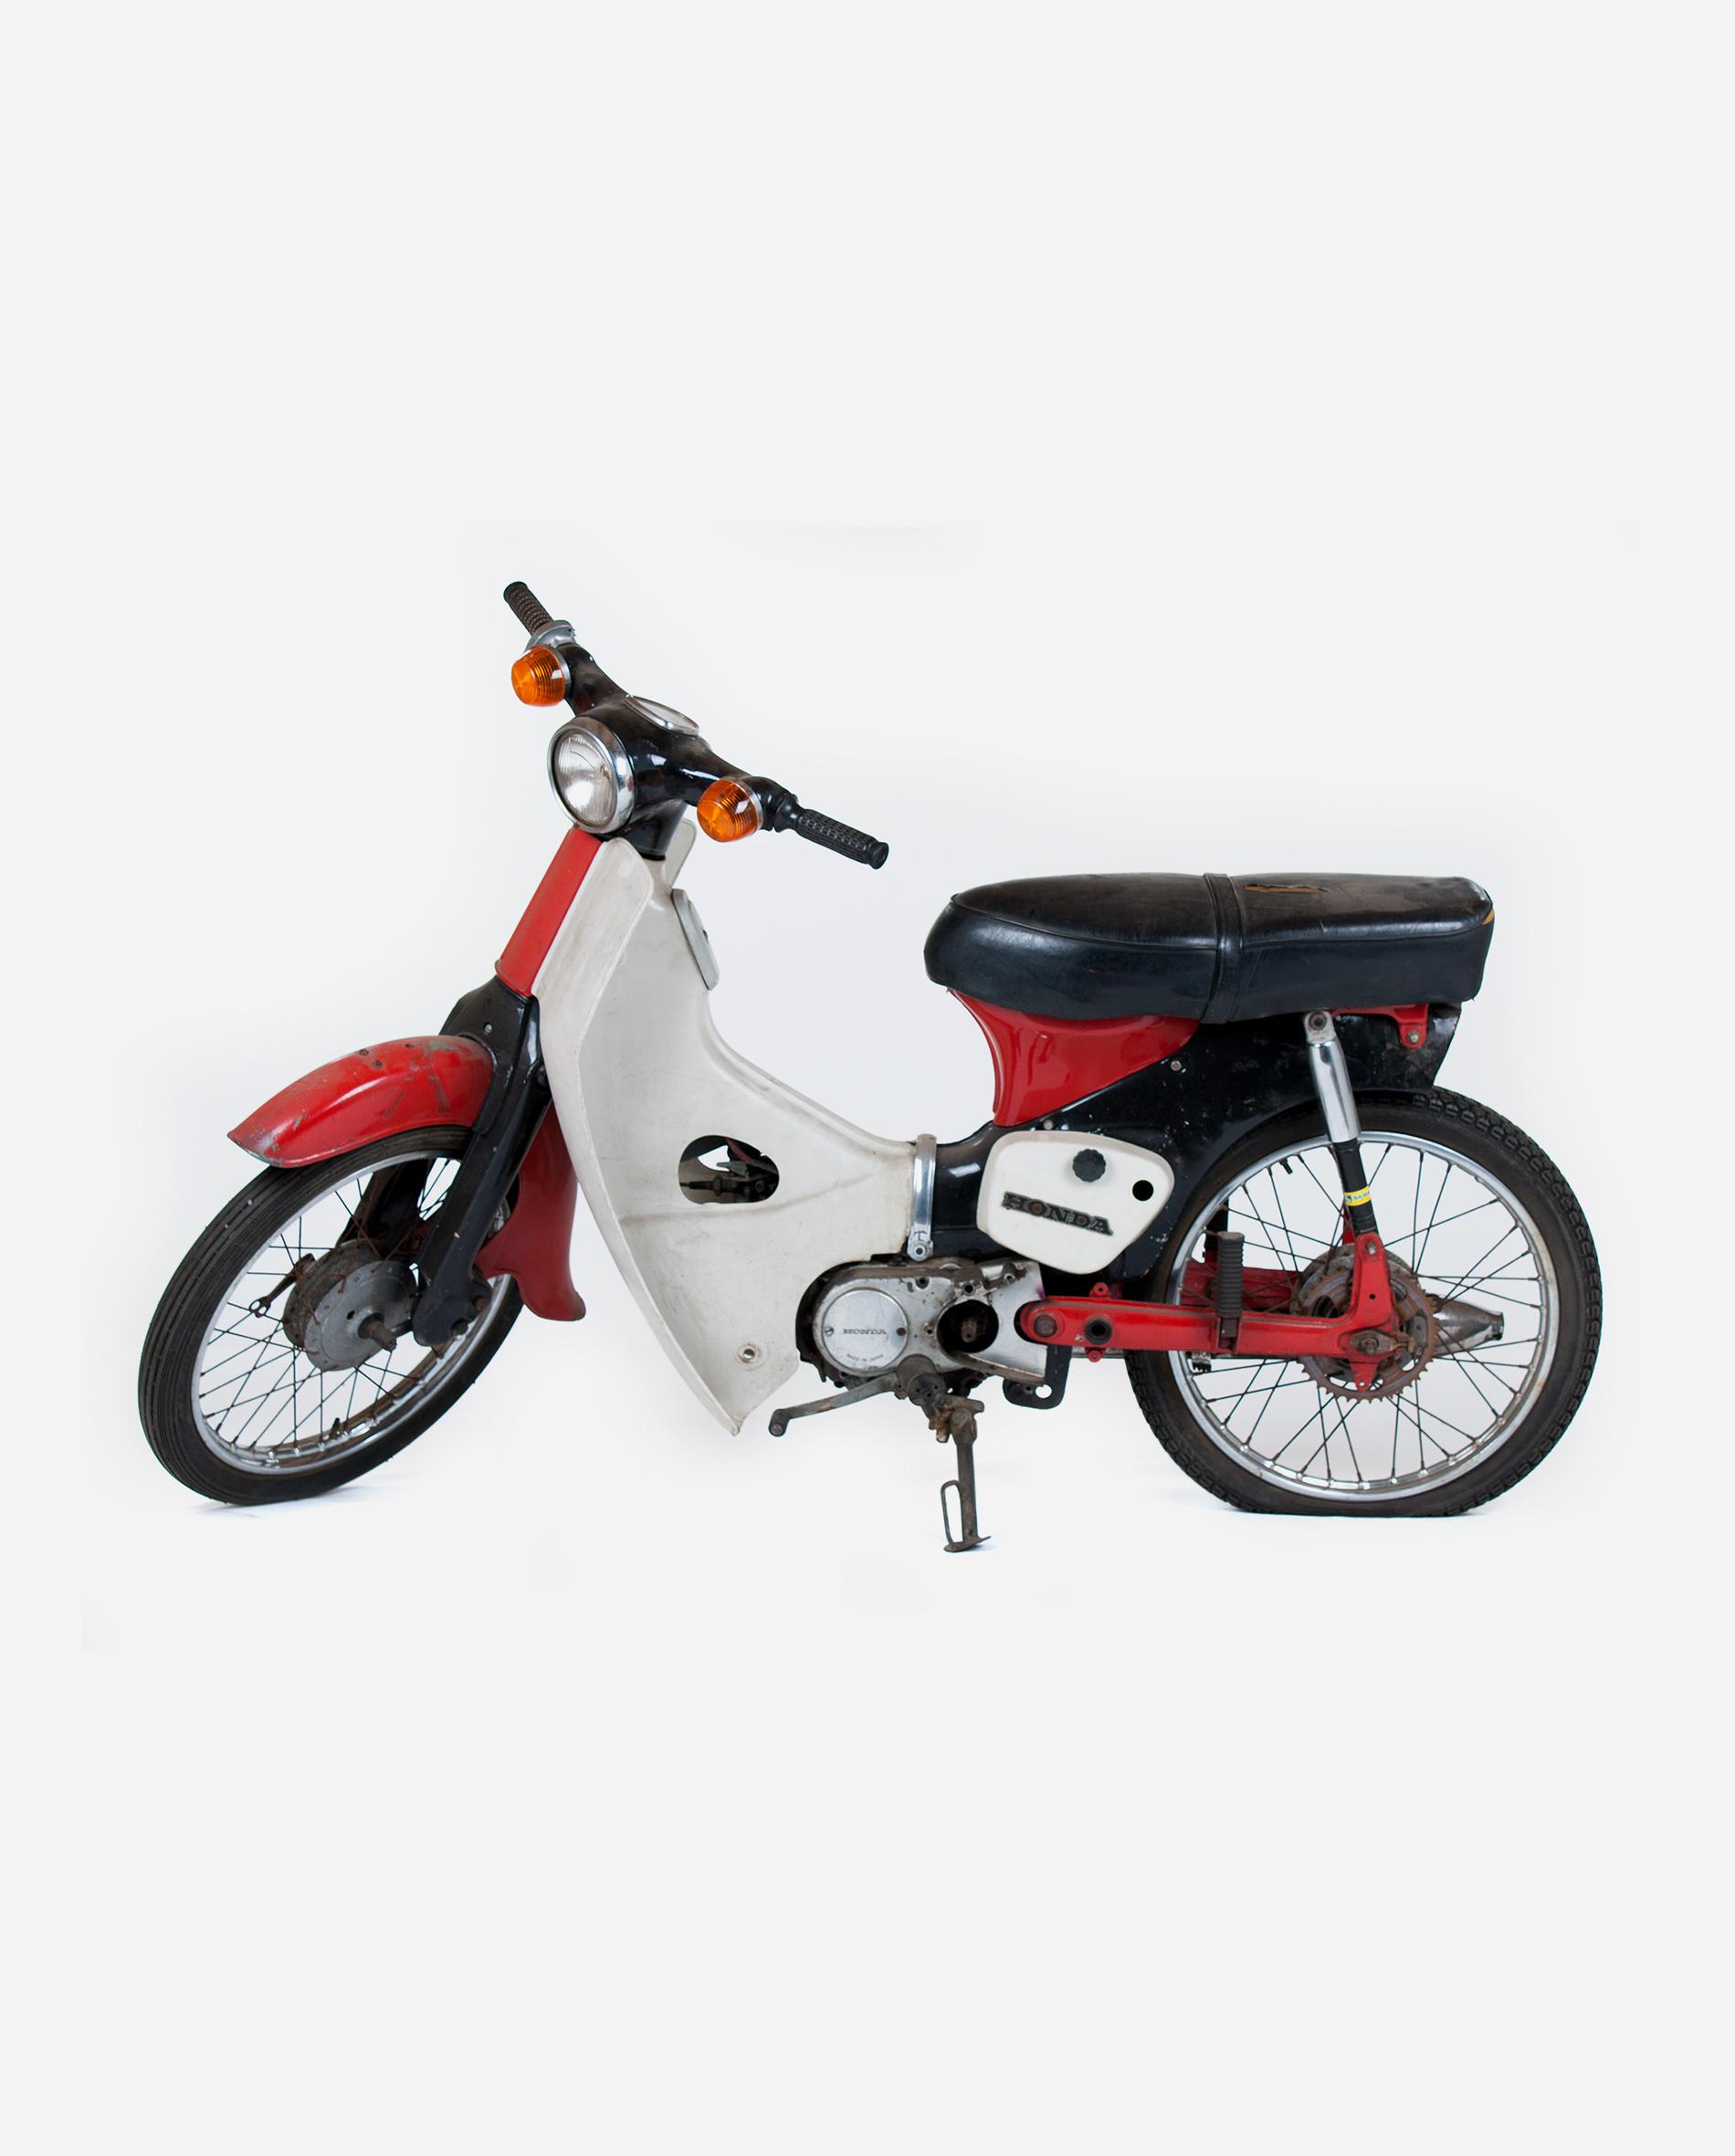 Honda-c50-afgezaagd-spatbord-l · Fourstrokebarn